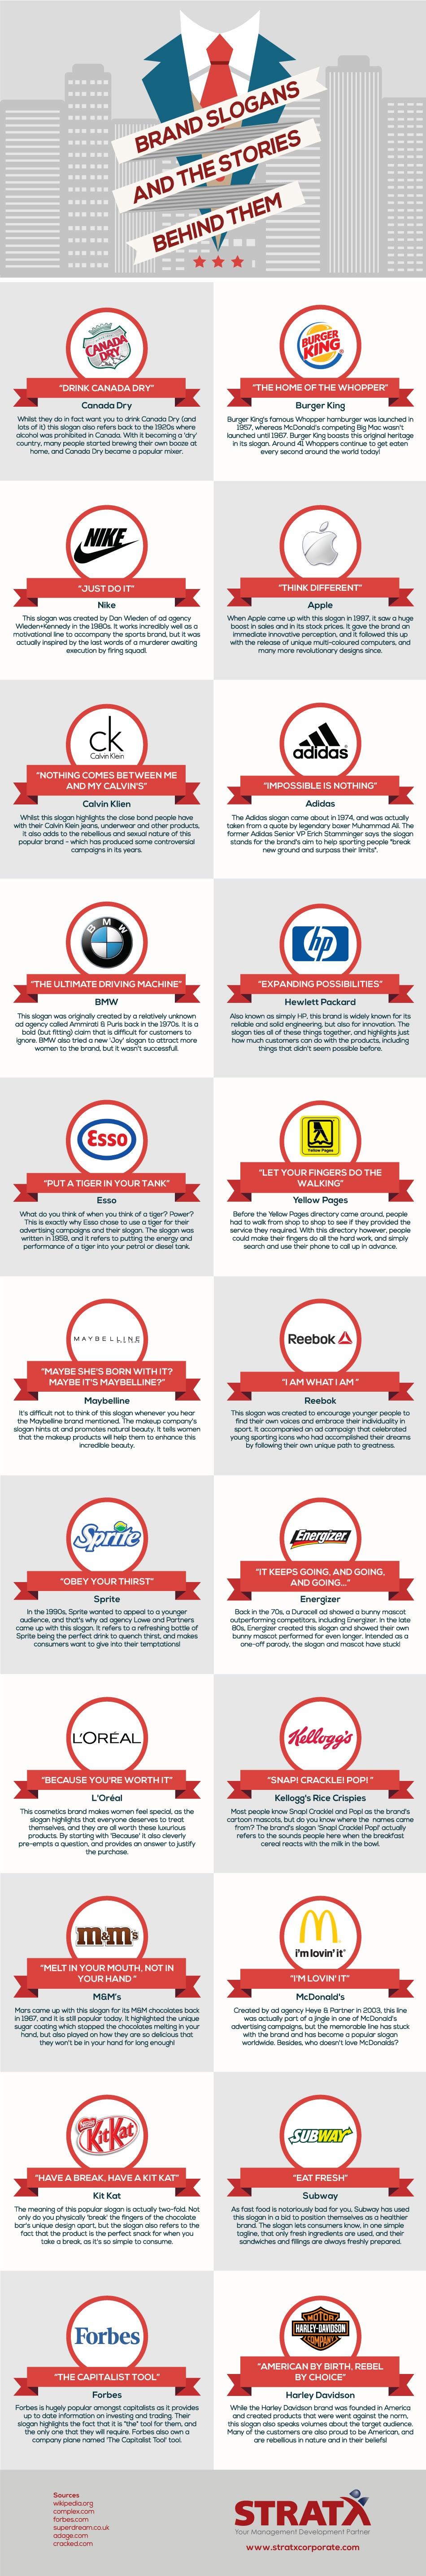 story-brand-slogan-infographic.jpg